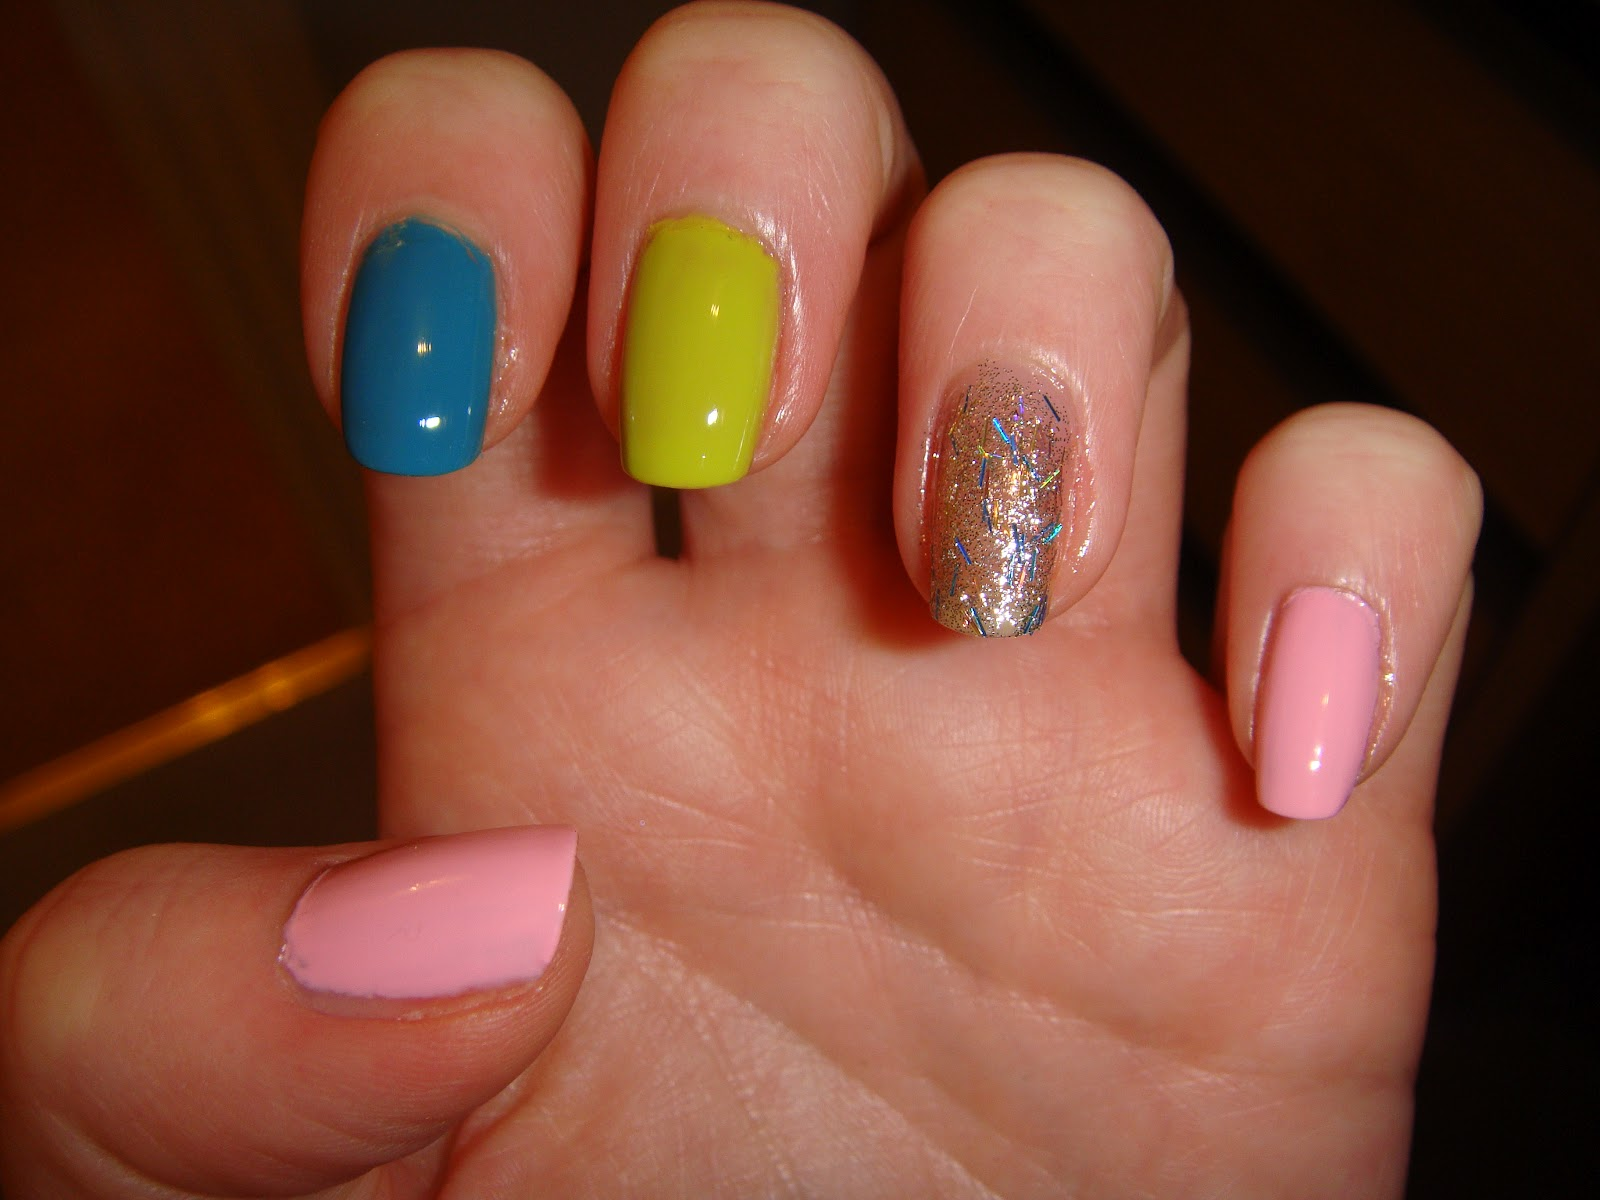 Nicki Minaj Opi Mini Nail Polish Collection Part 2